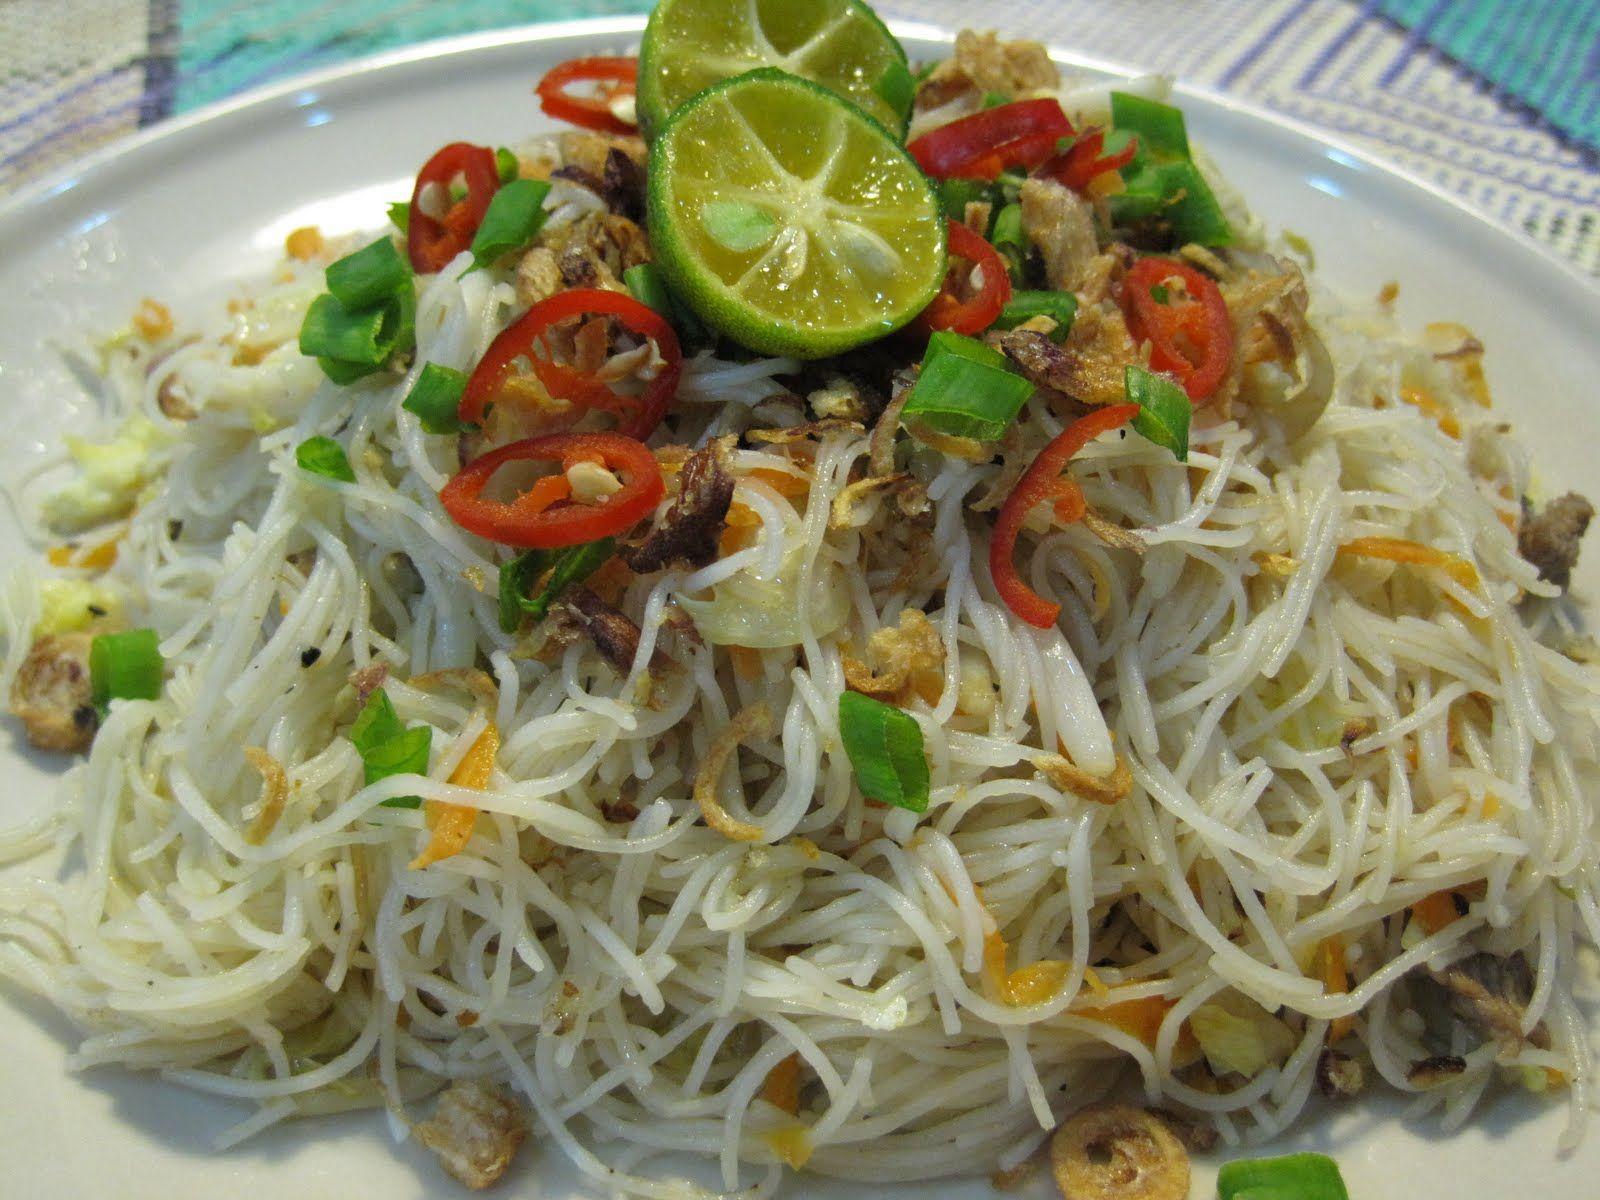 Mee Hoon Goreng Singapore | Resepi Minggu Ini | Malaysian Food | Pinterest | Singapore, Menu and